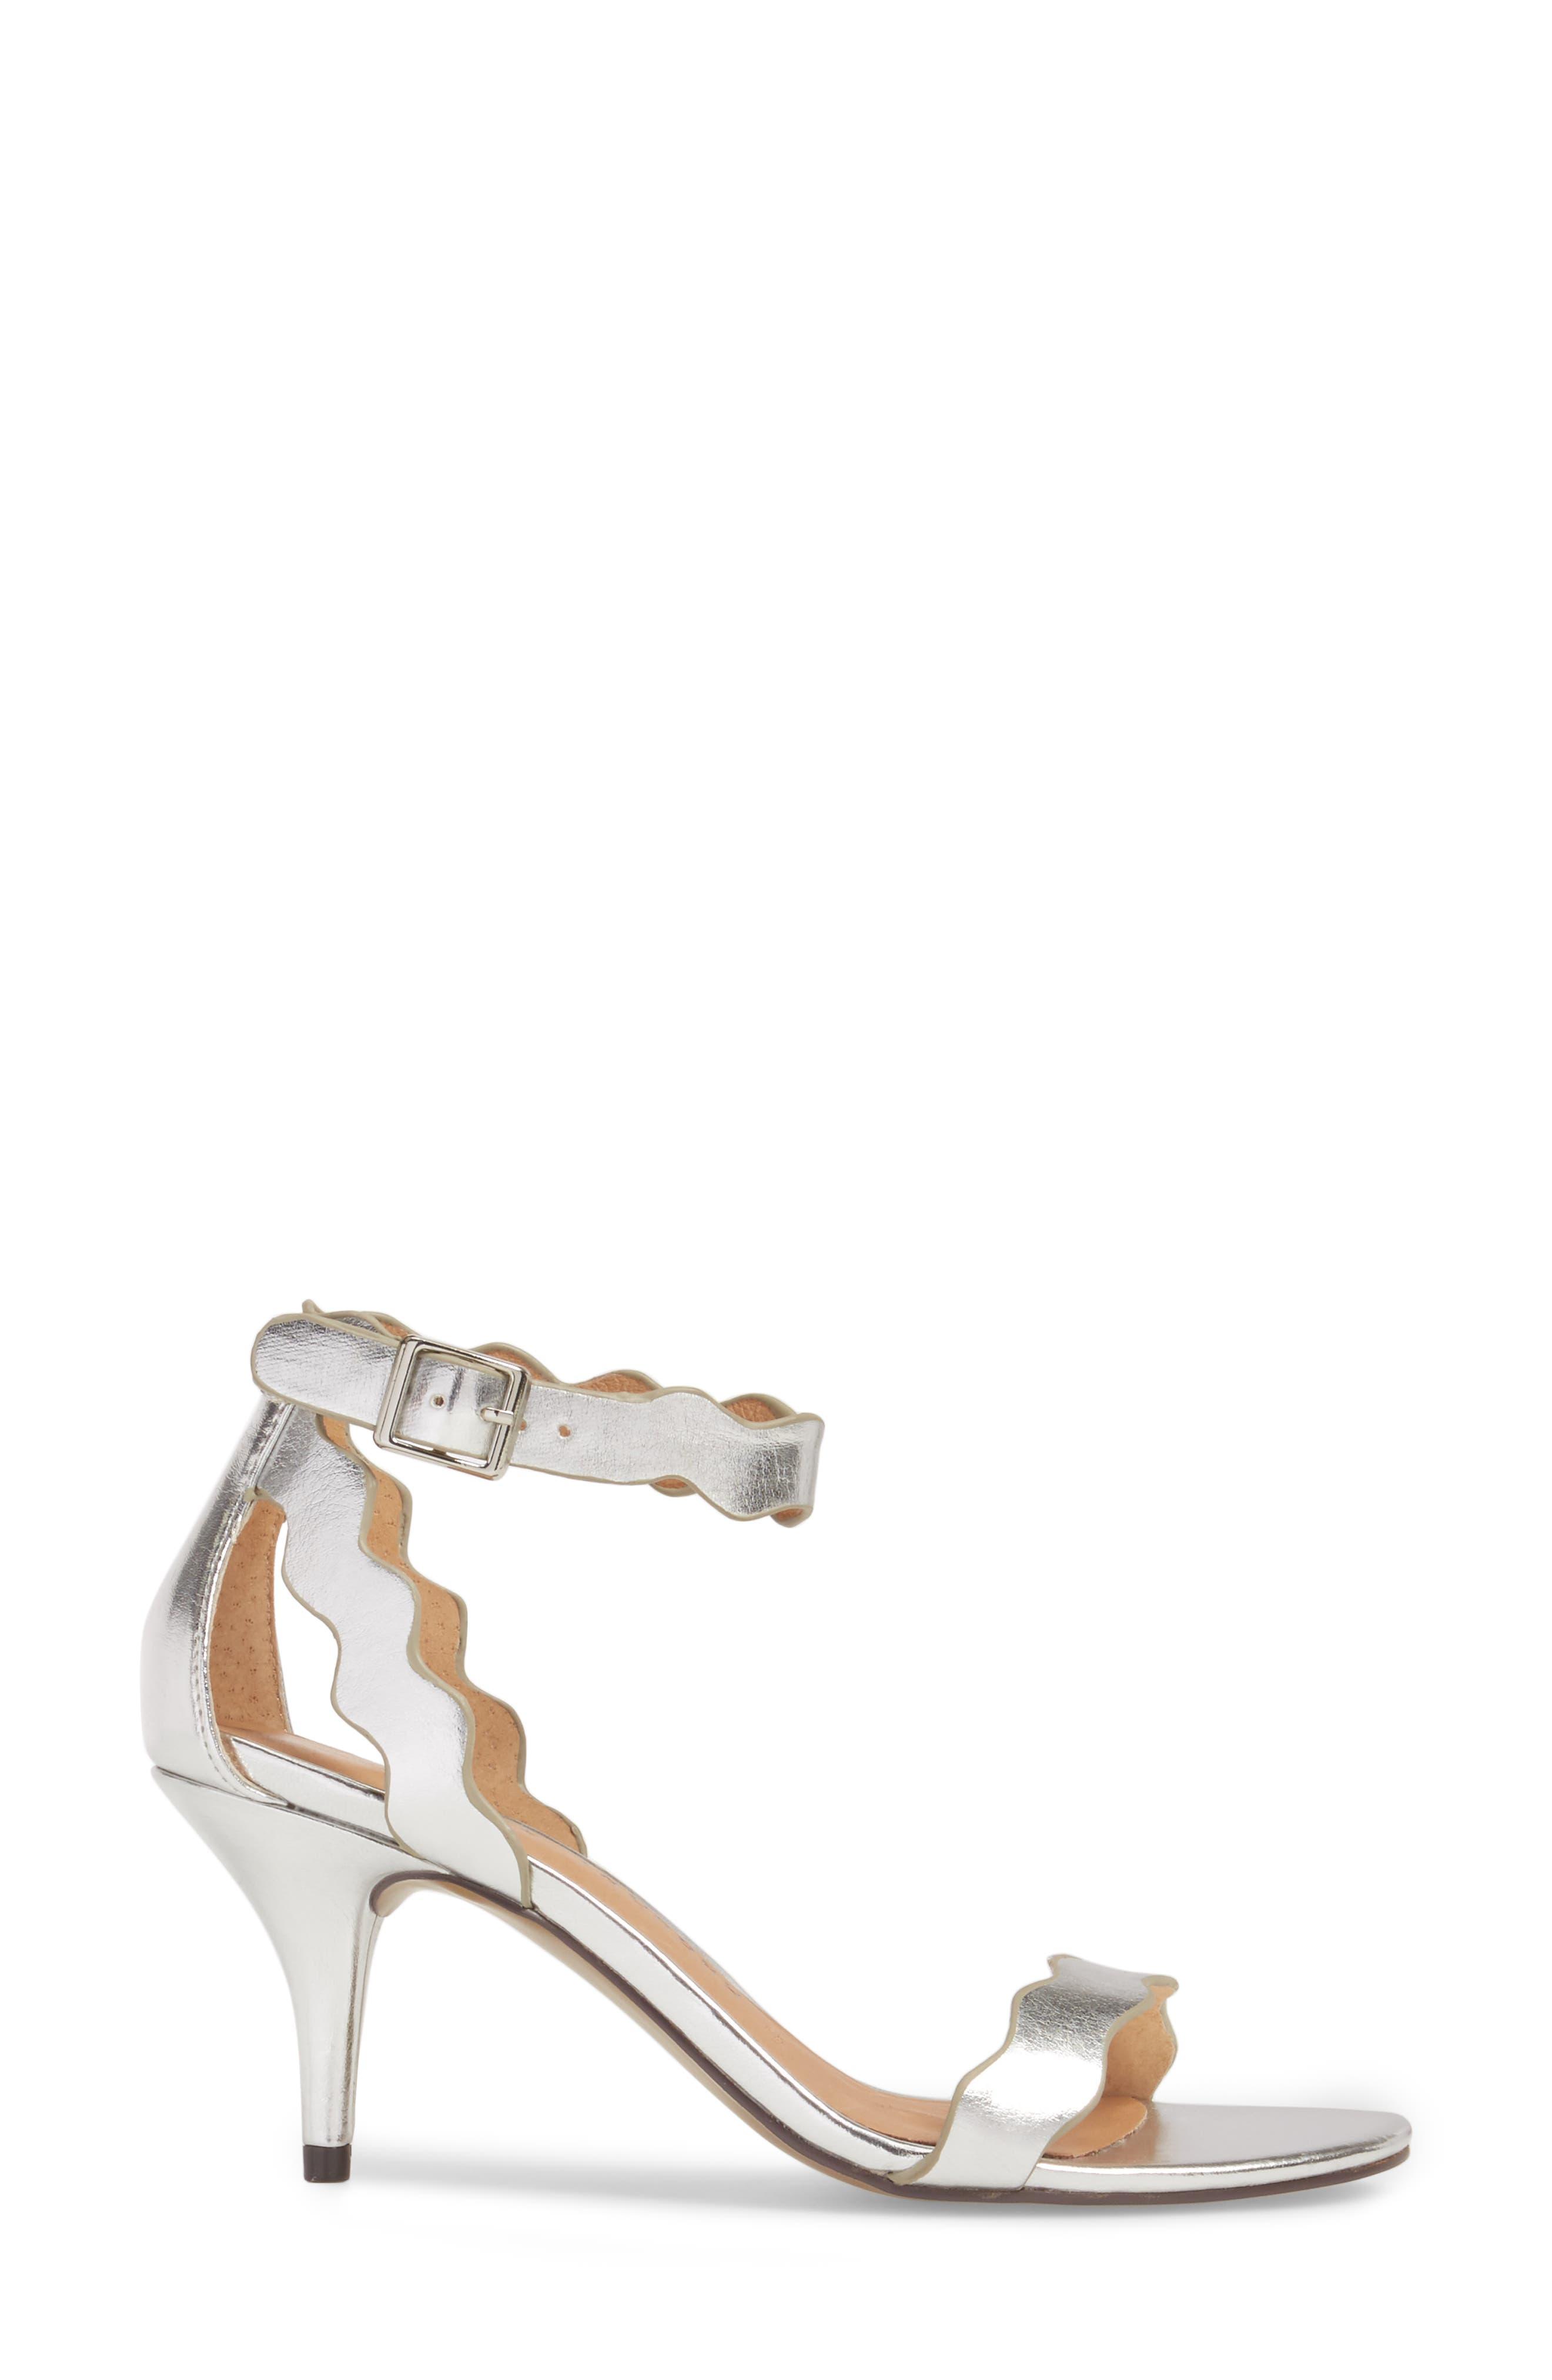 'Rubie' Scalloped Ankle Strap Sandal,                             Alternate thumbnail 3, color,                             040